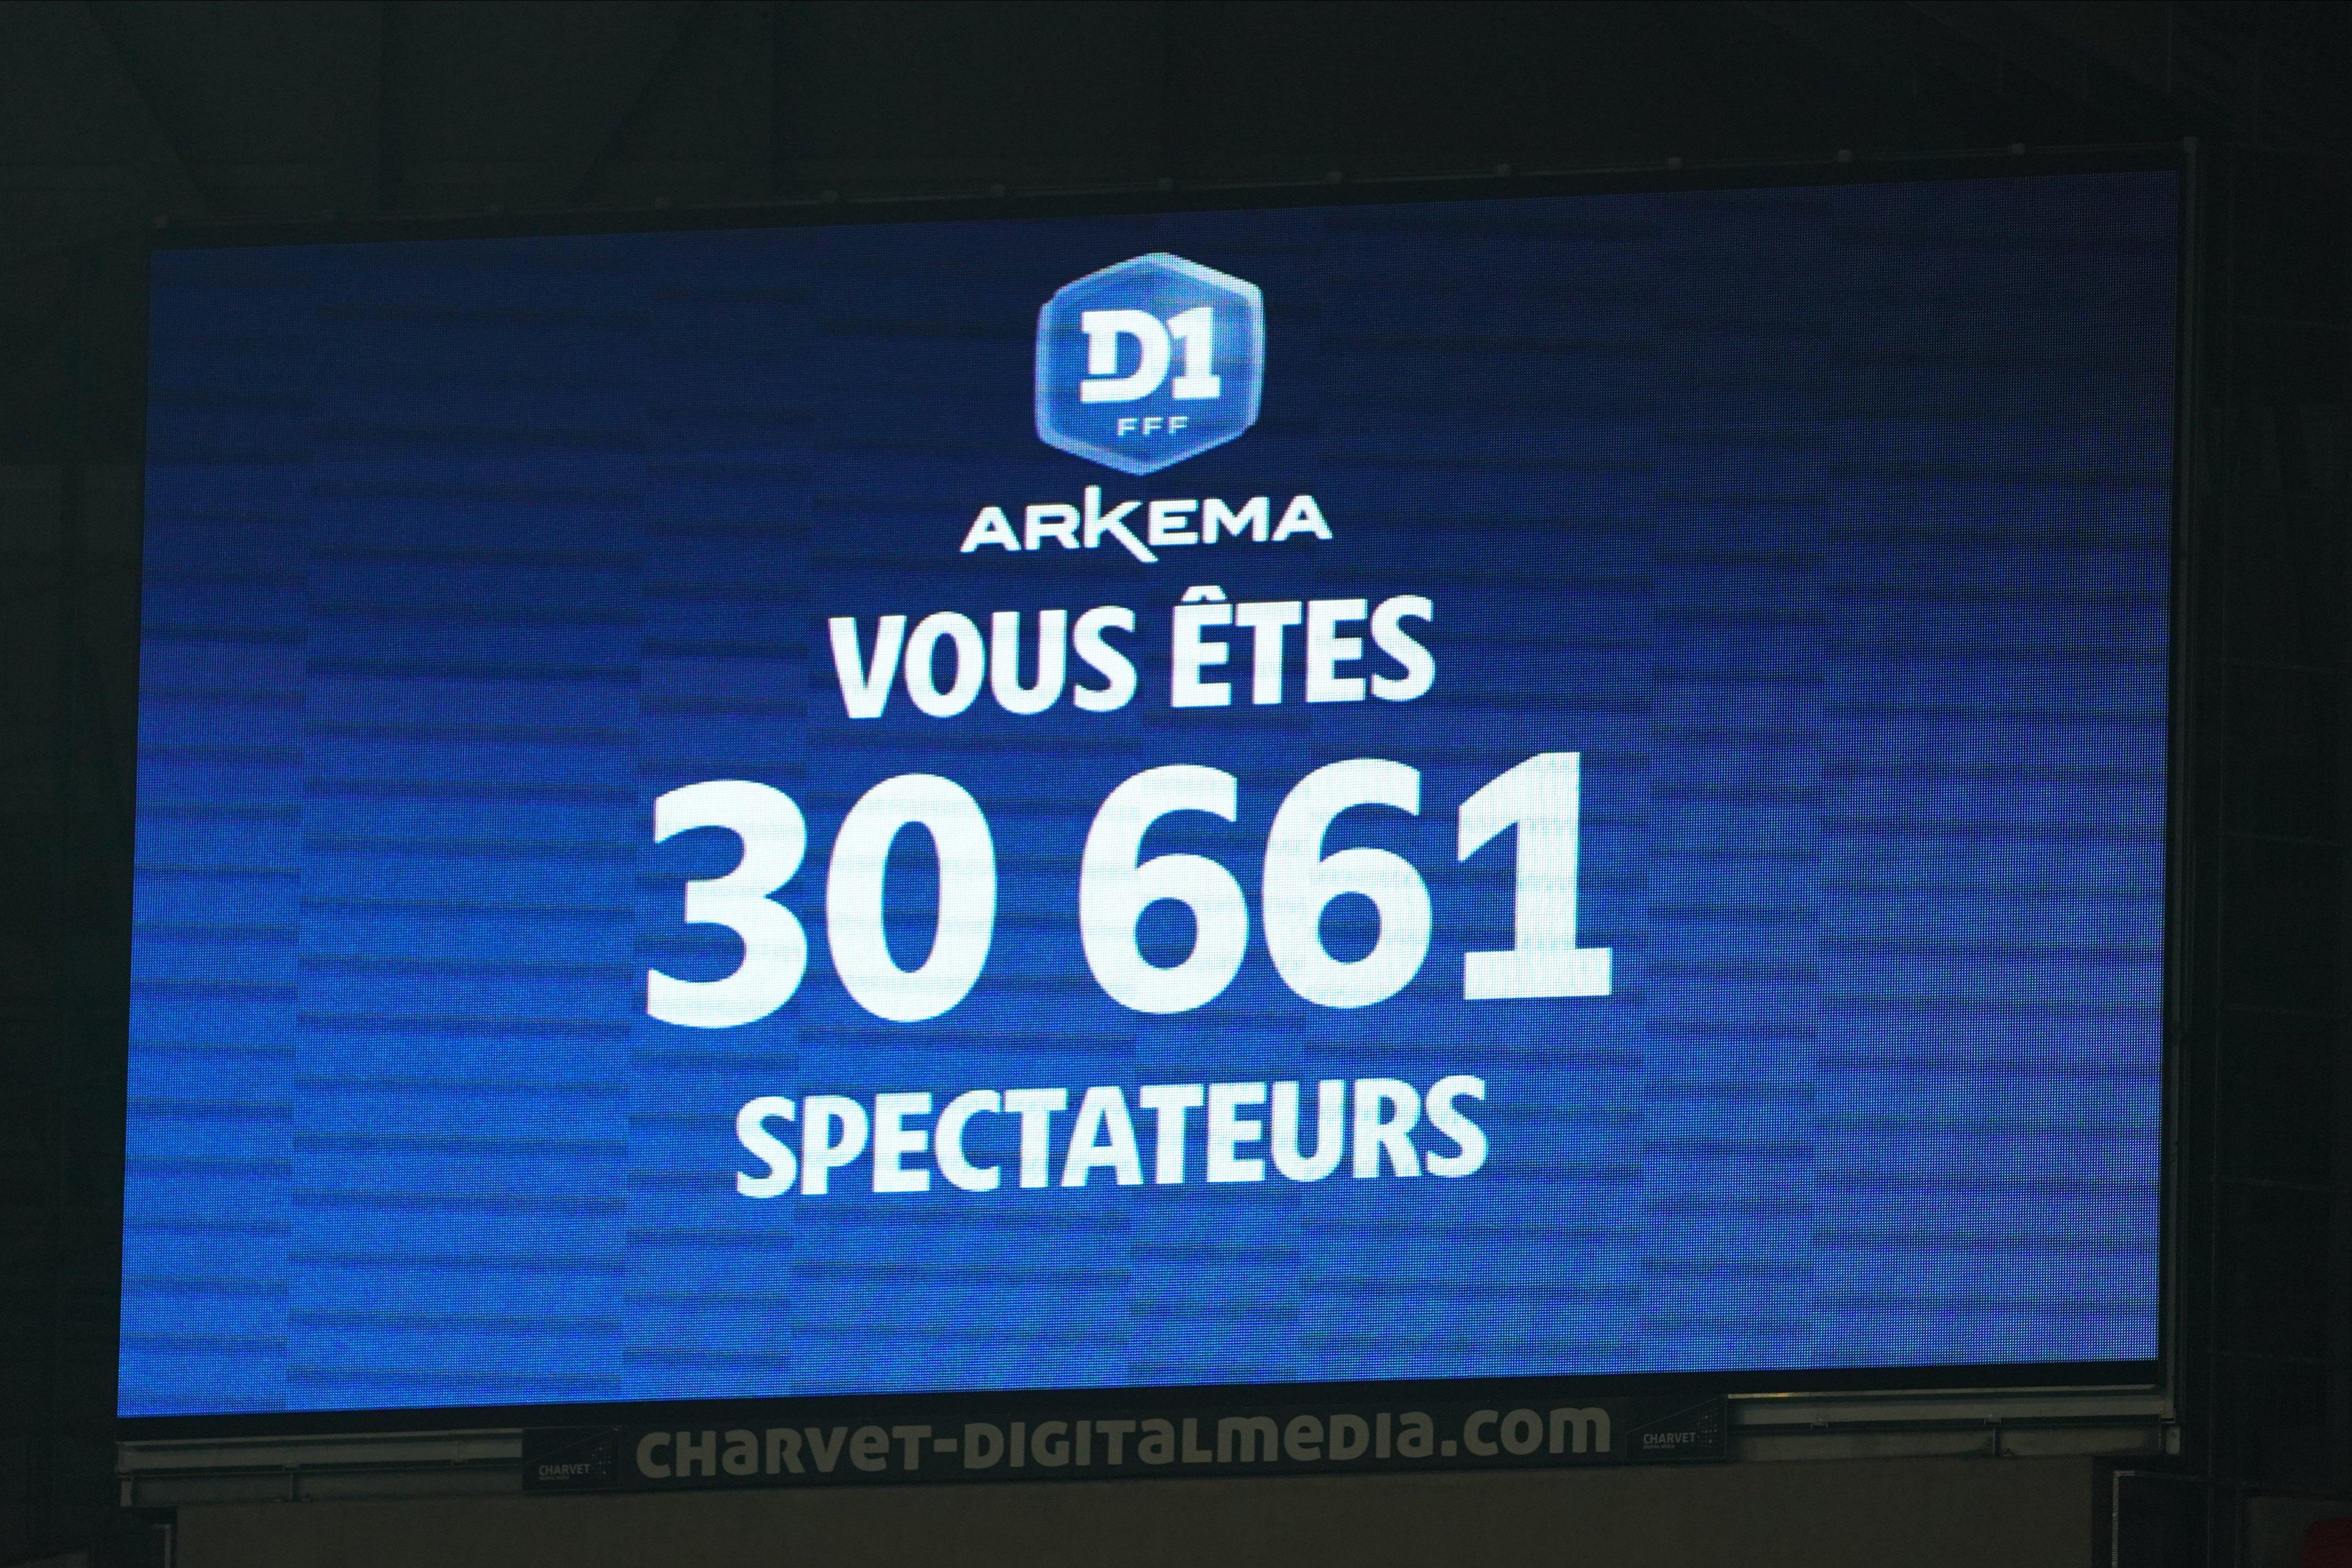 #D1Arkema - L'OL remporte le choc